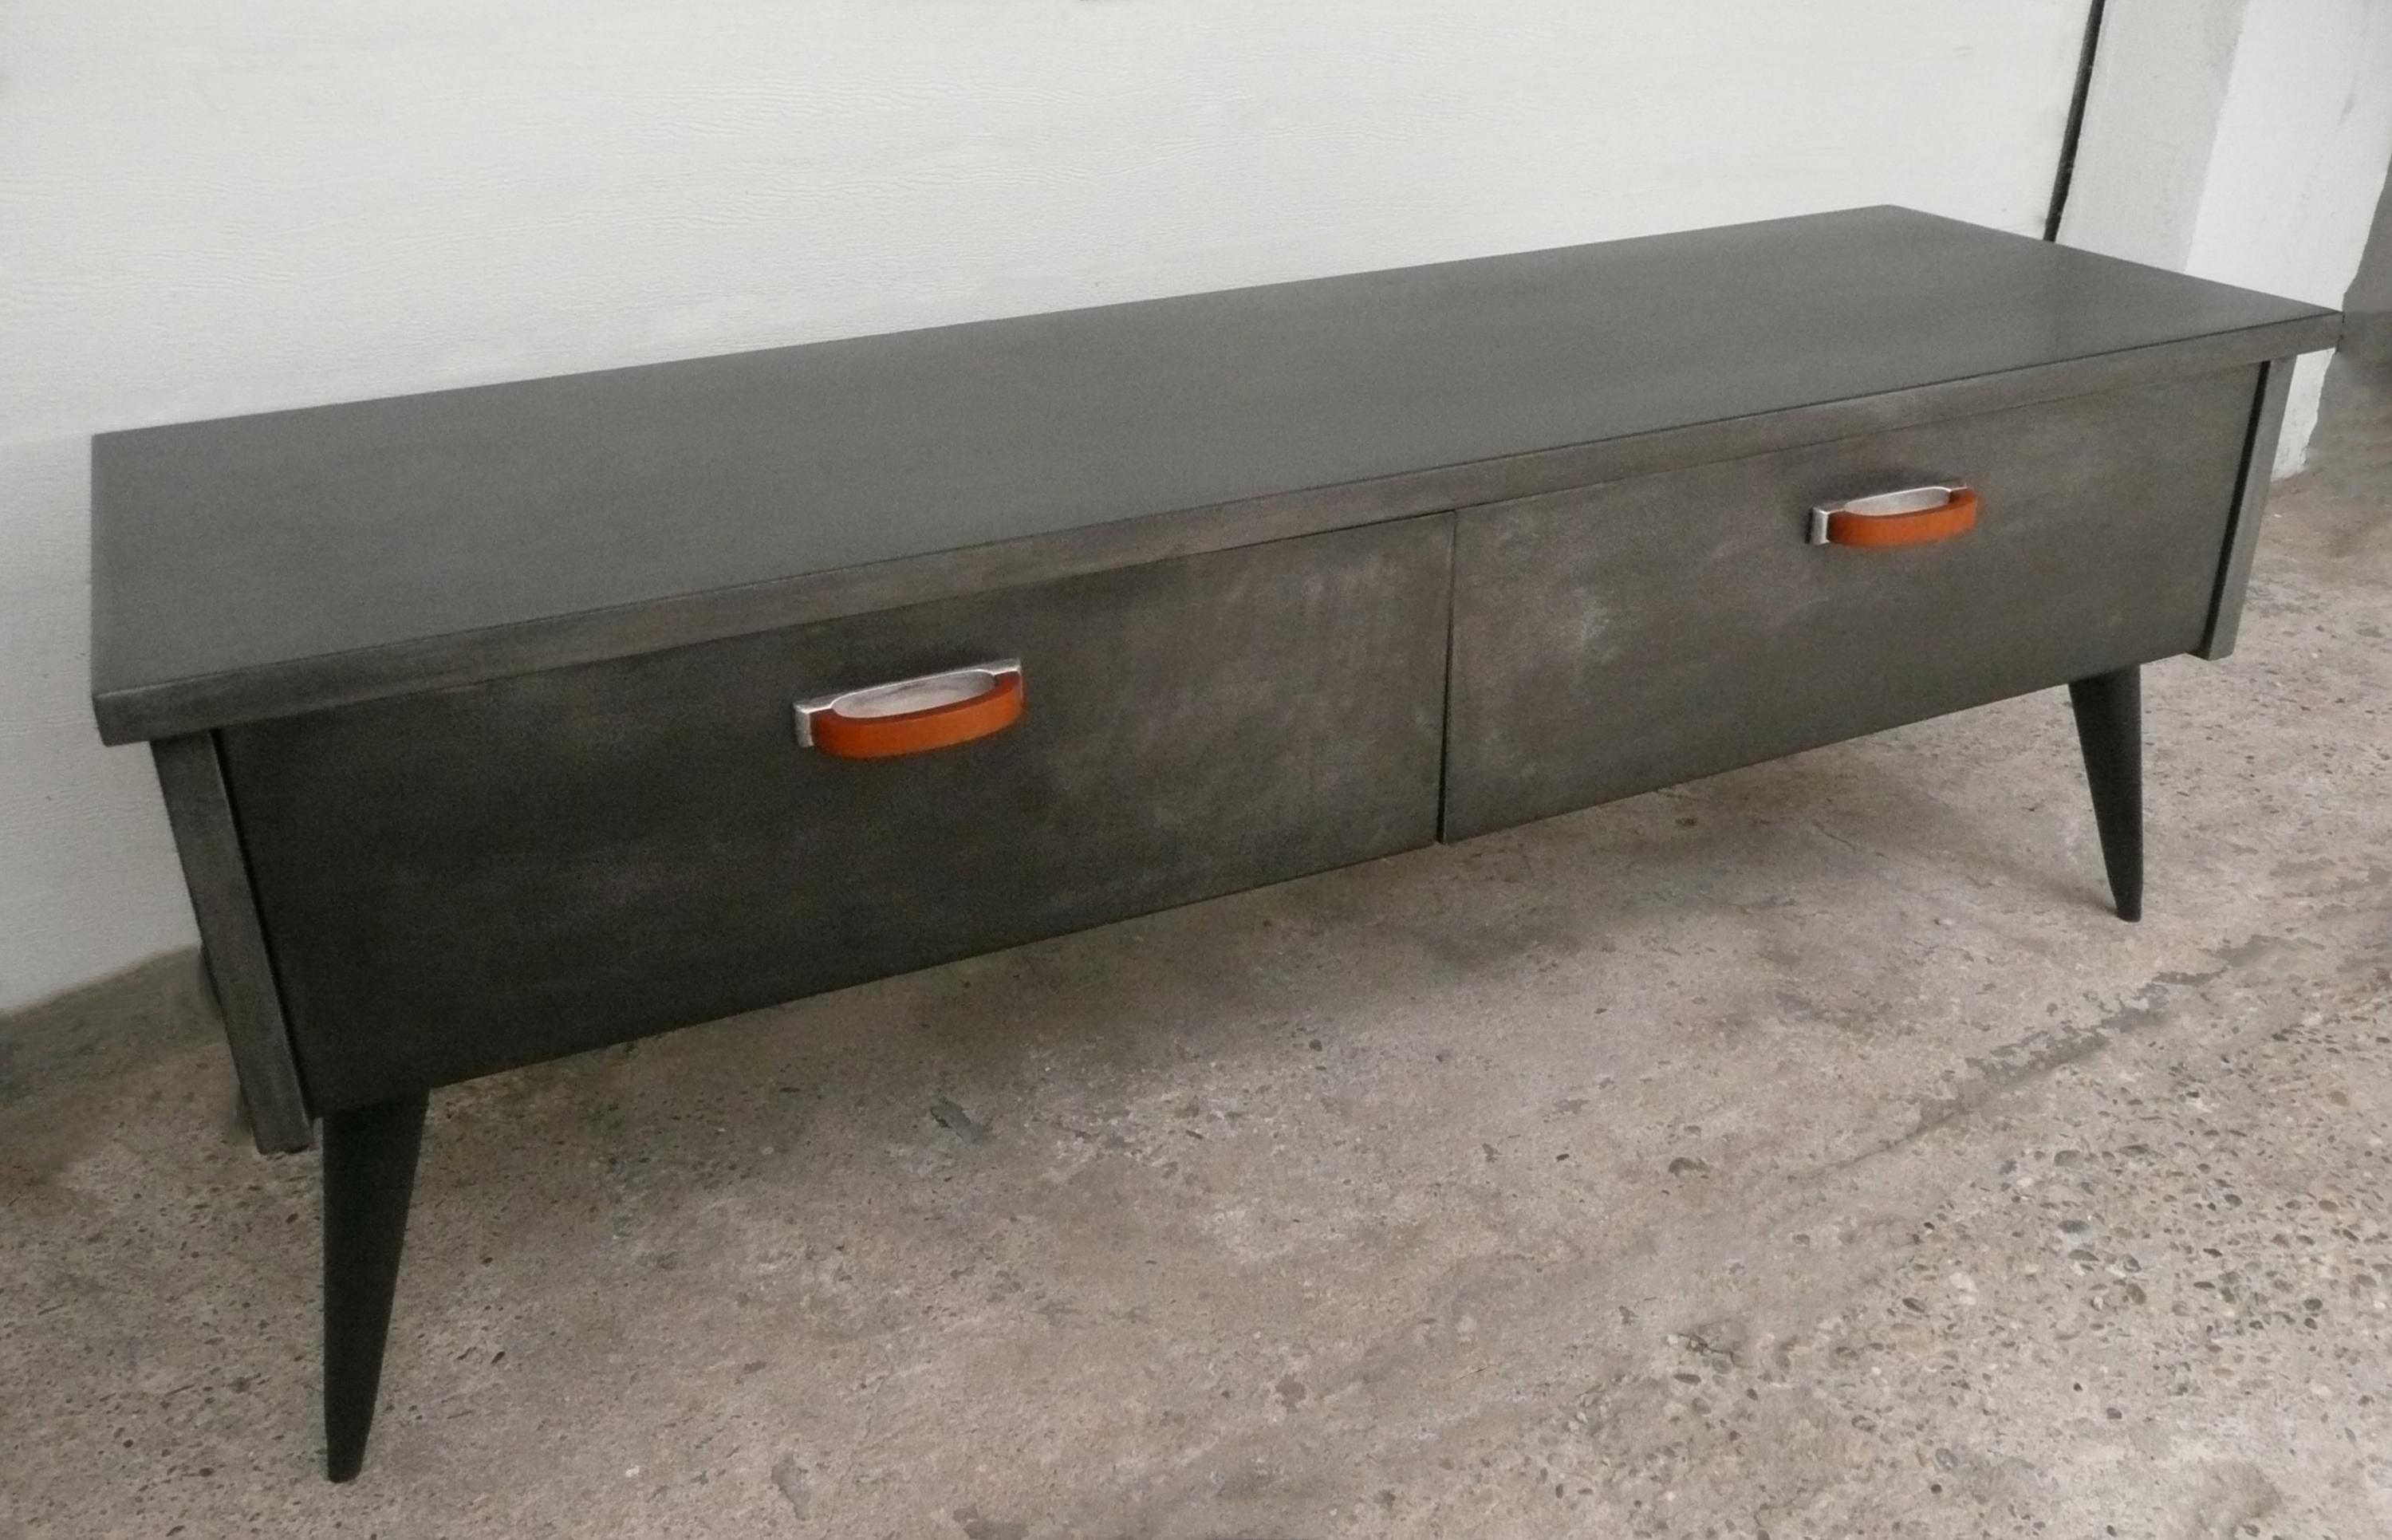 meuble bas metal meuble bas metal rouge with meuble bas. Black Bedroom Furniture Sets. Home Design Ideas